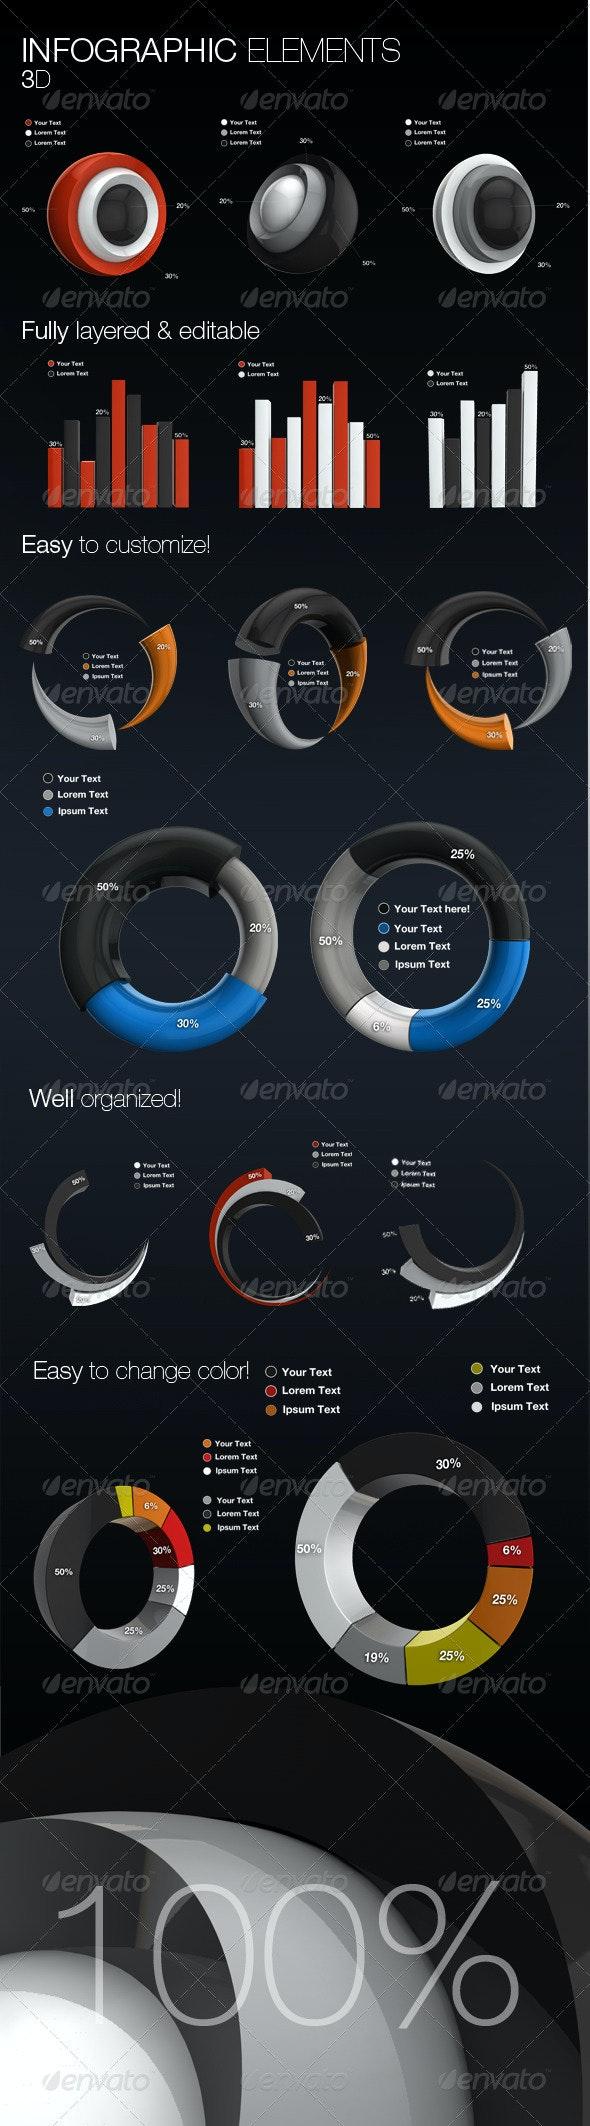 Infographic Elements 3D - Infographics